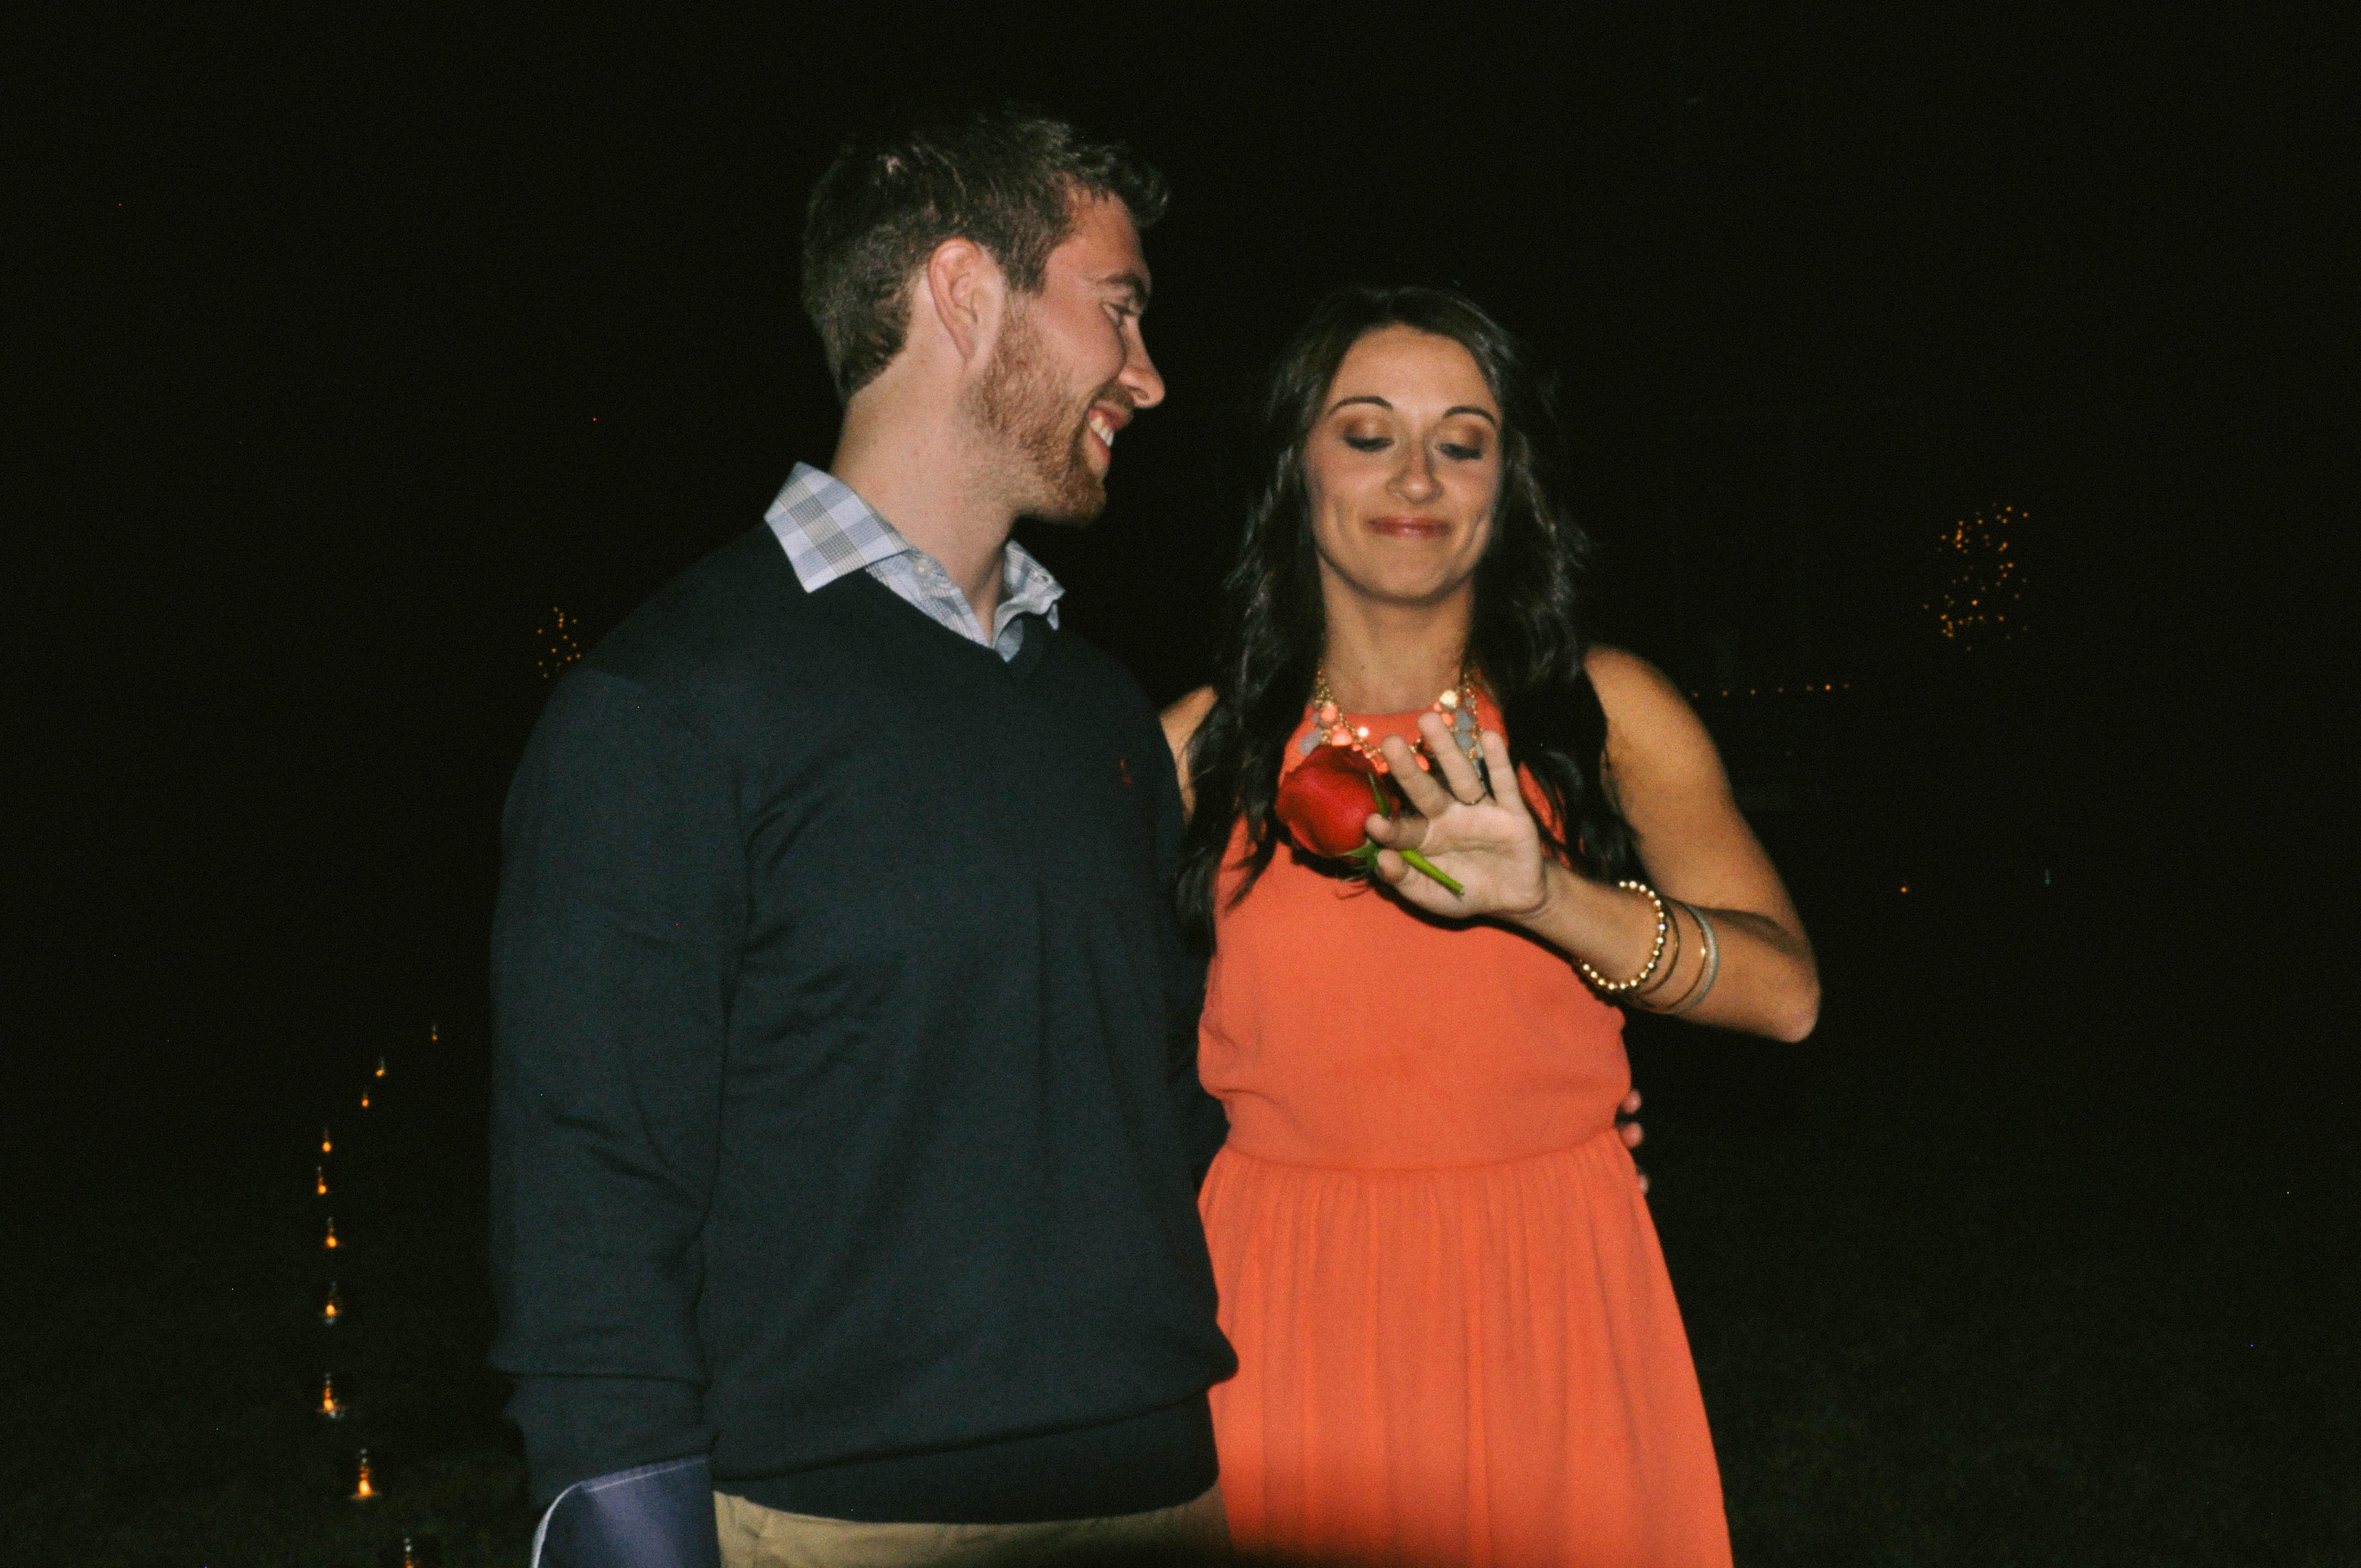 Scavenger_Hunt_Marriage_Proposal_DSC_0346